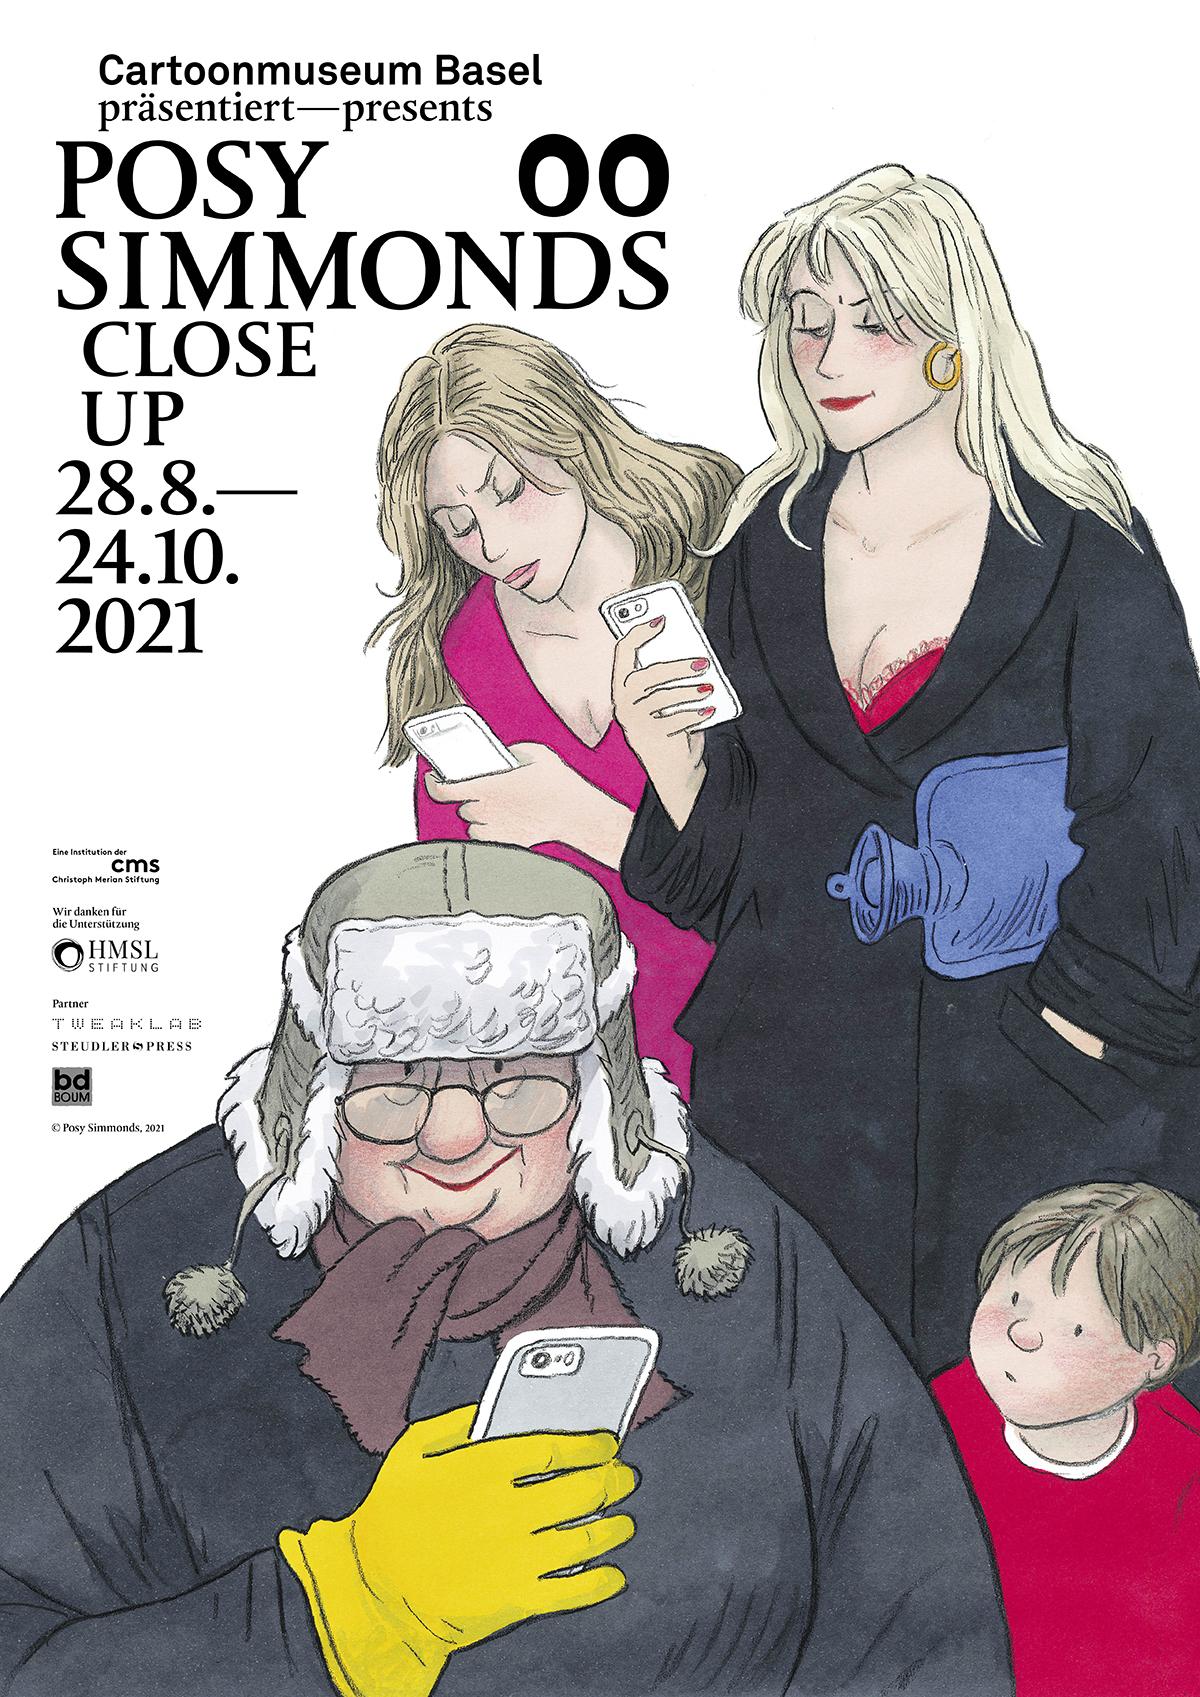 00 Ausstellungsplakat Posy Simmonds Close Up amu